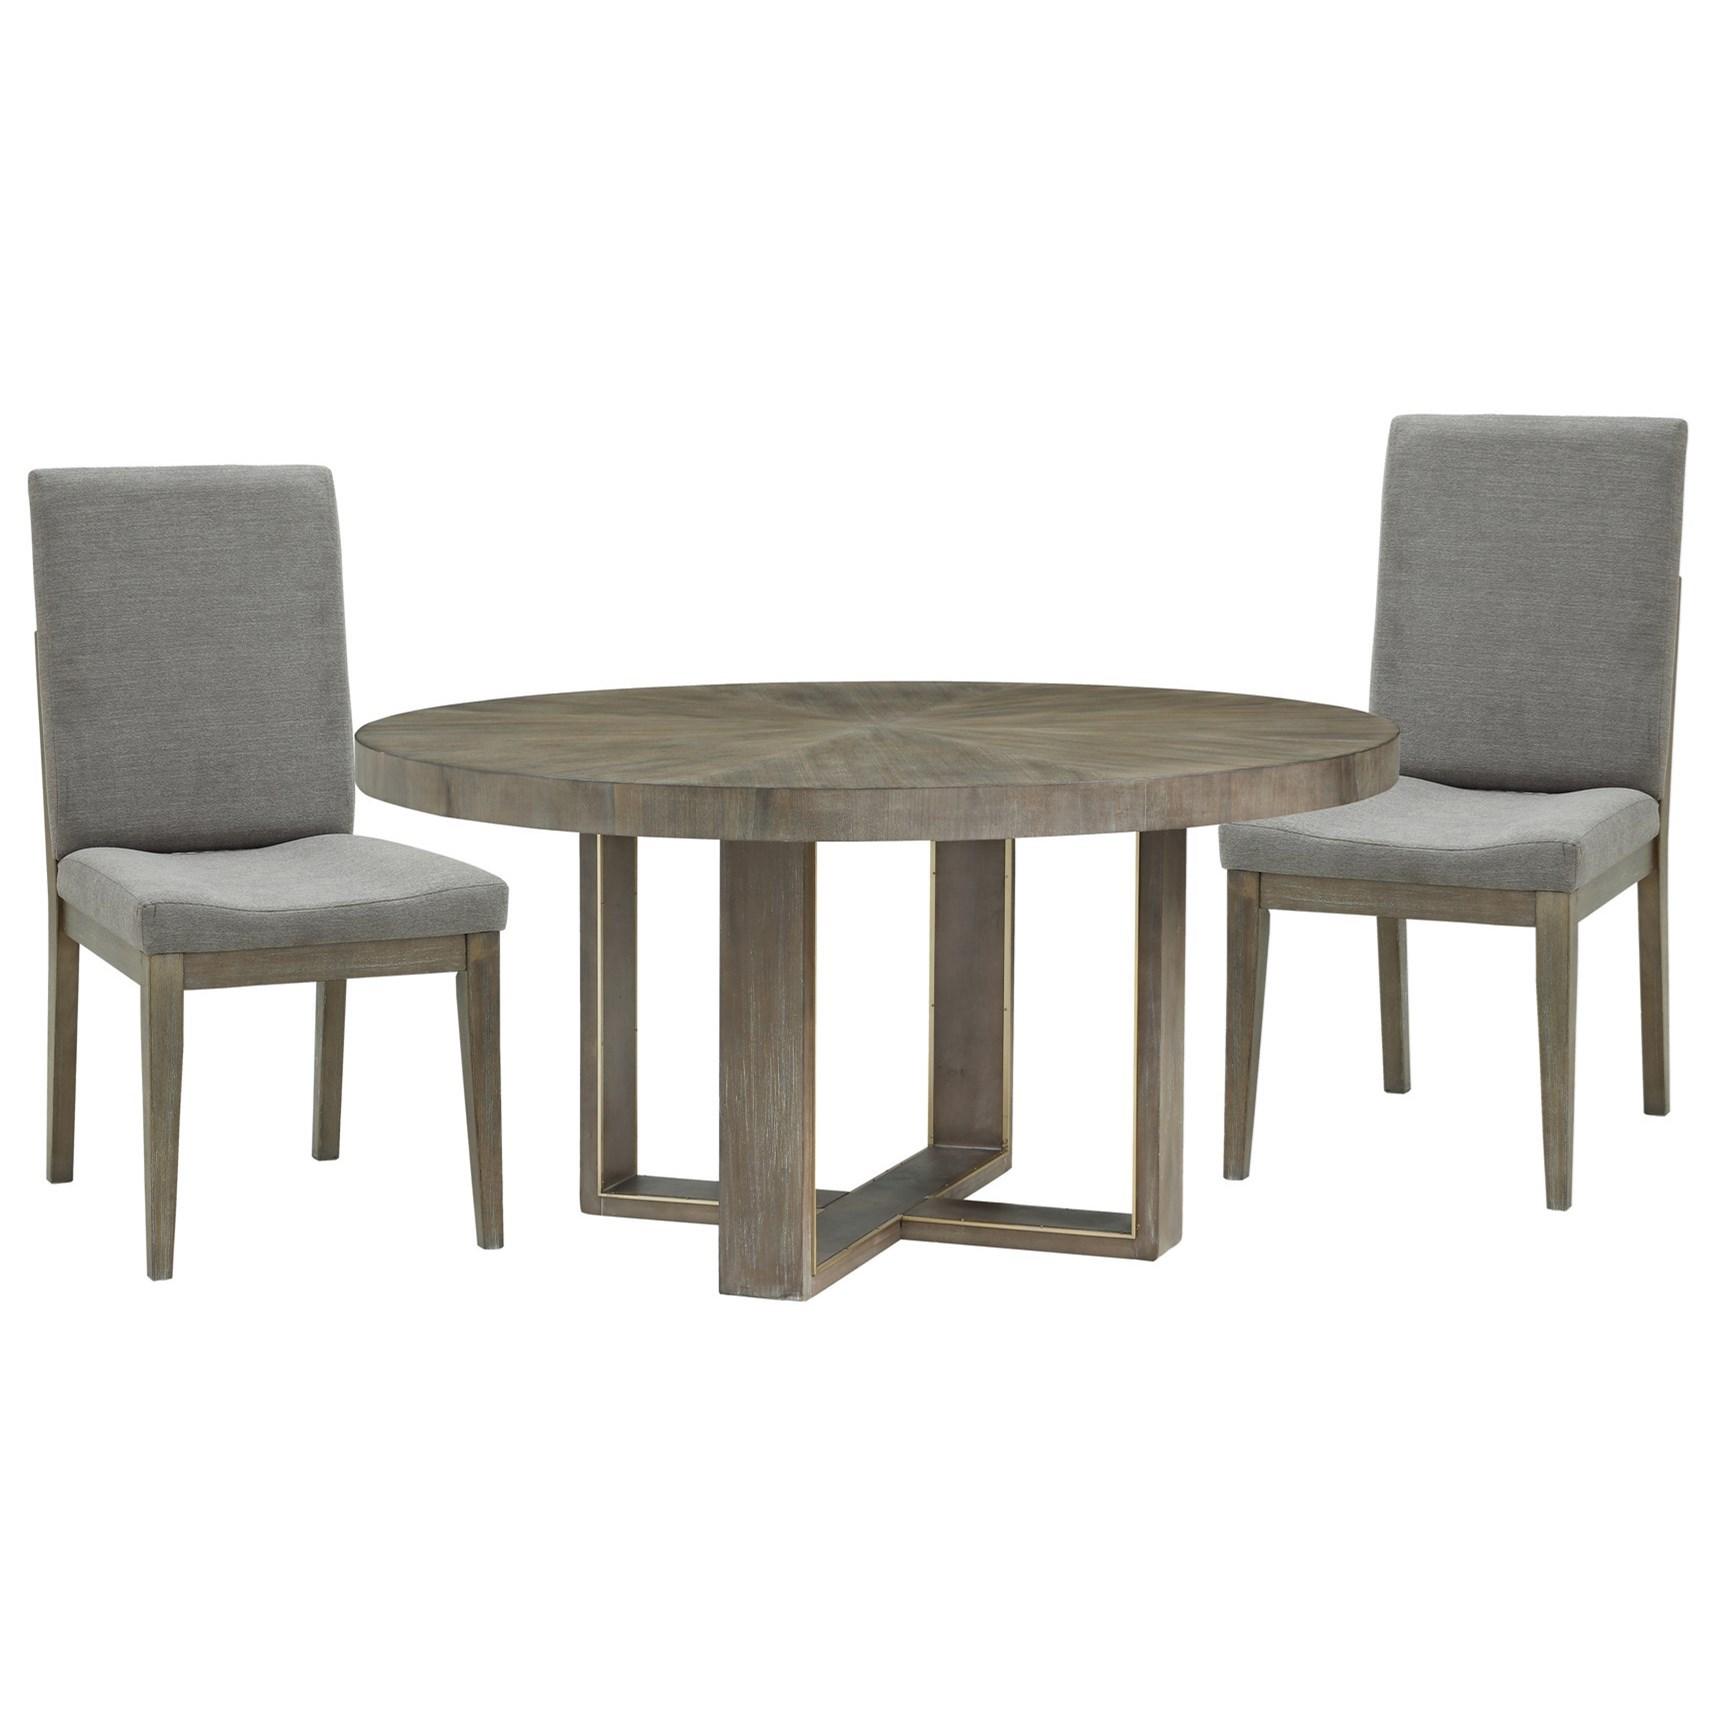 Legends Furniture Tango Contemporary 3 Piece Round Dining Set